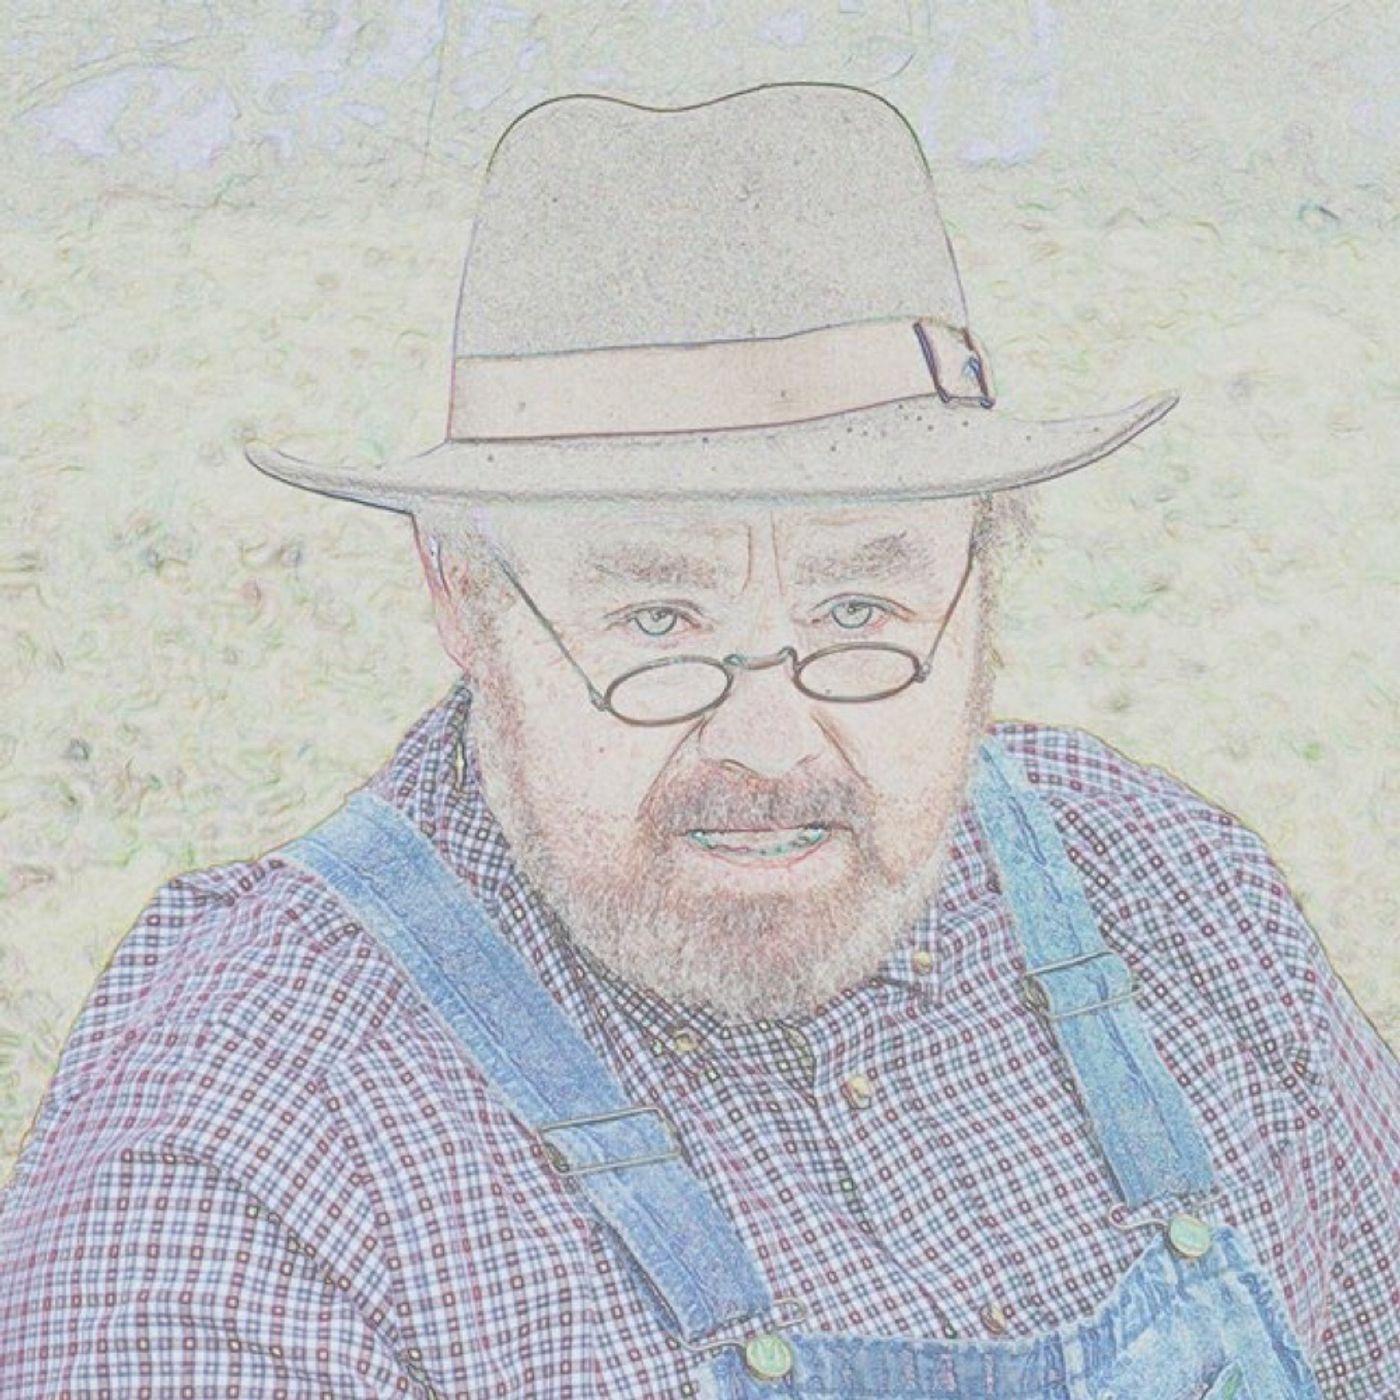 Uncle Otis, The TN Peddler